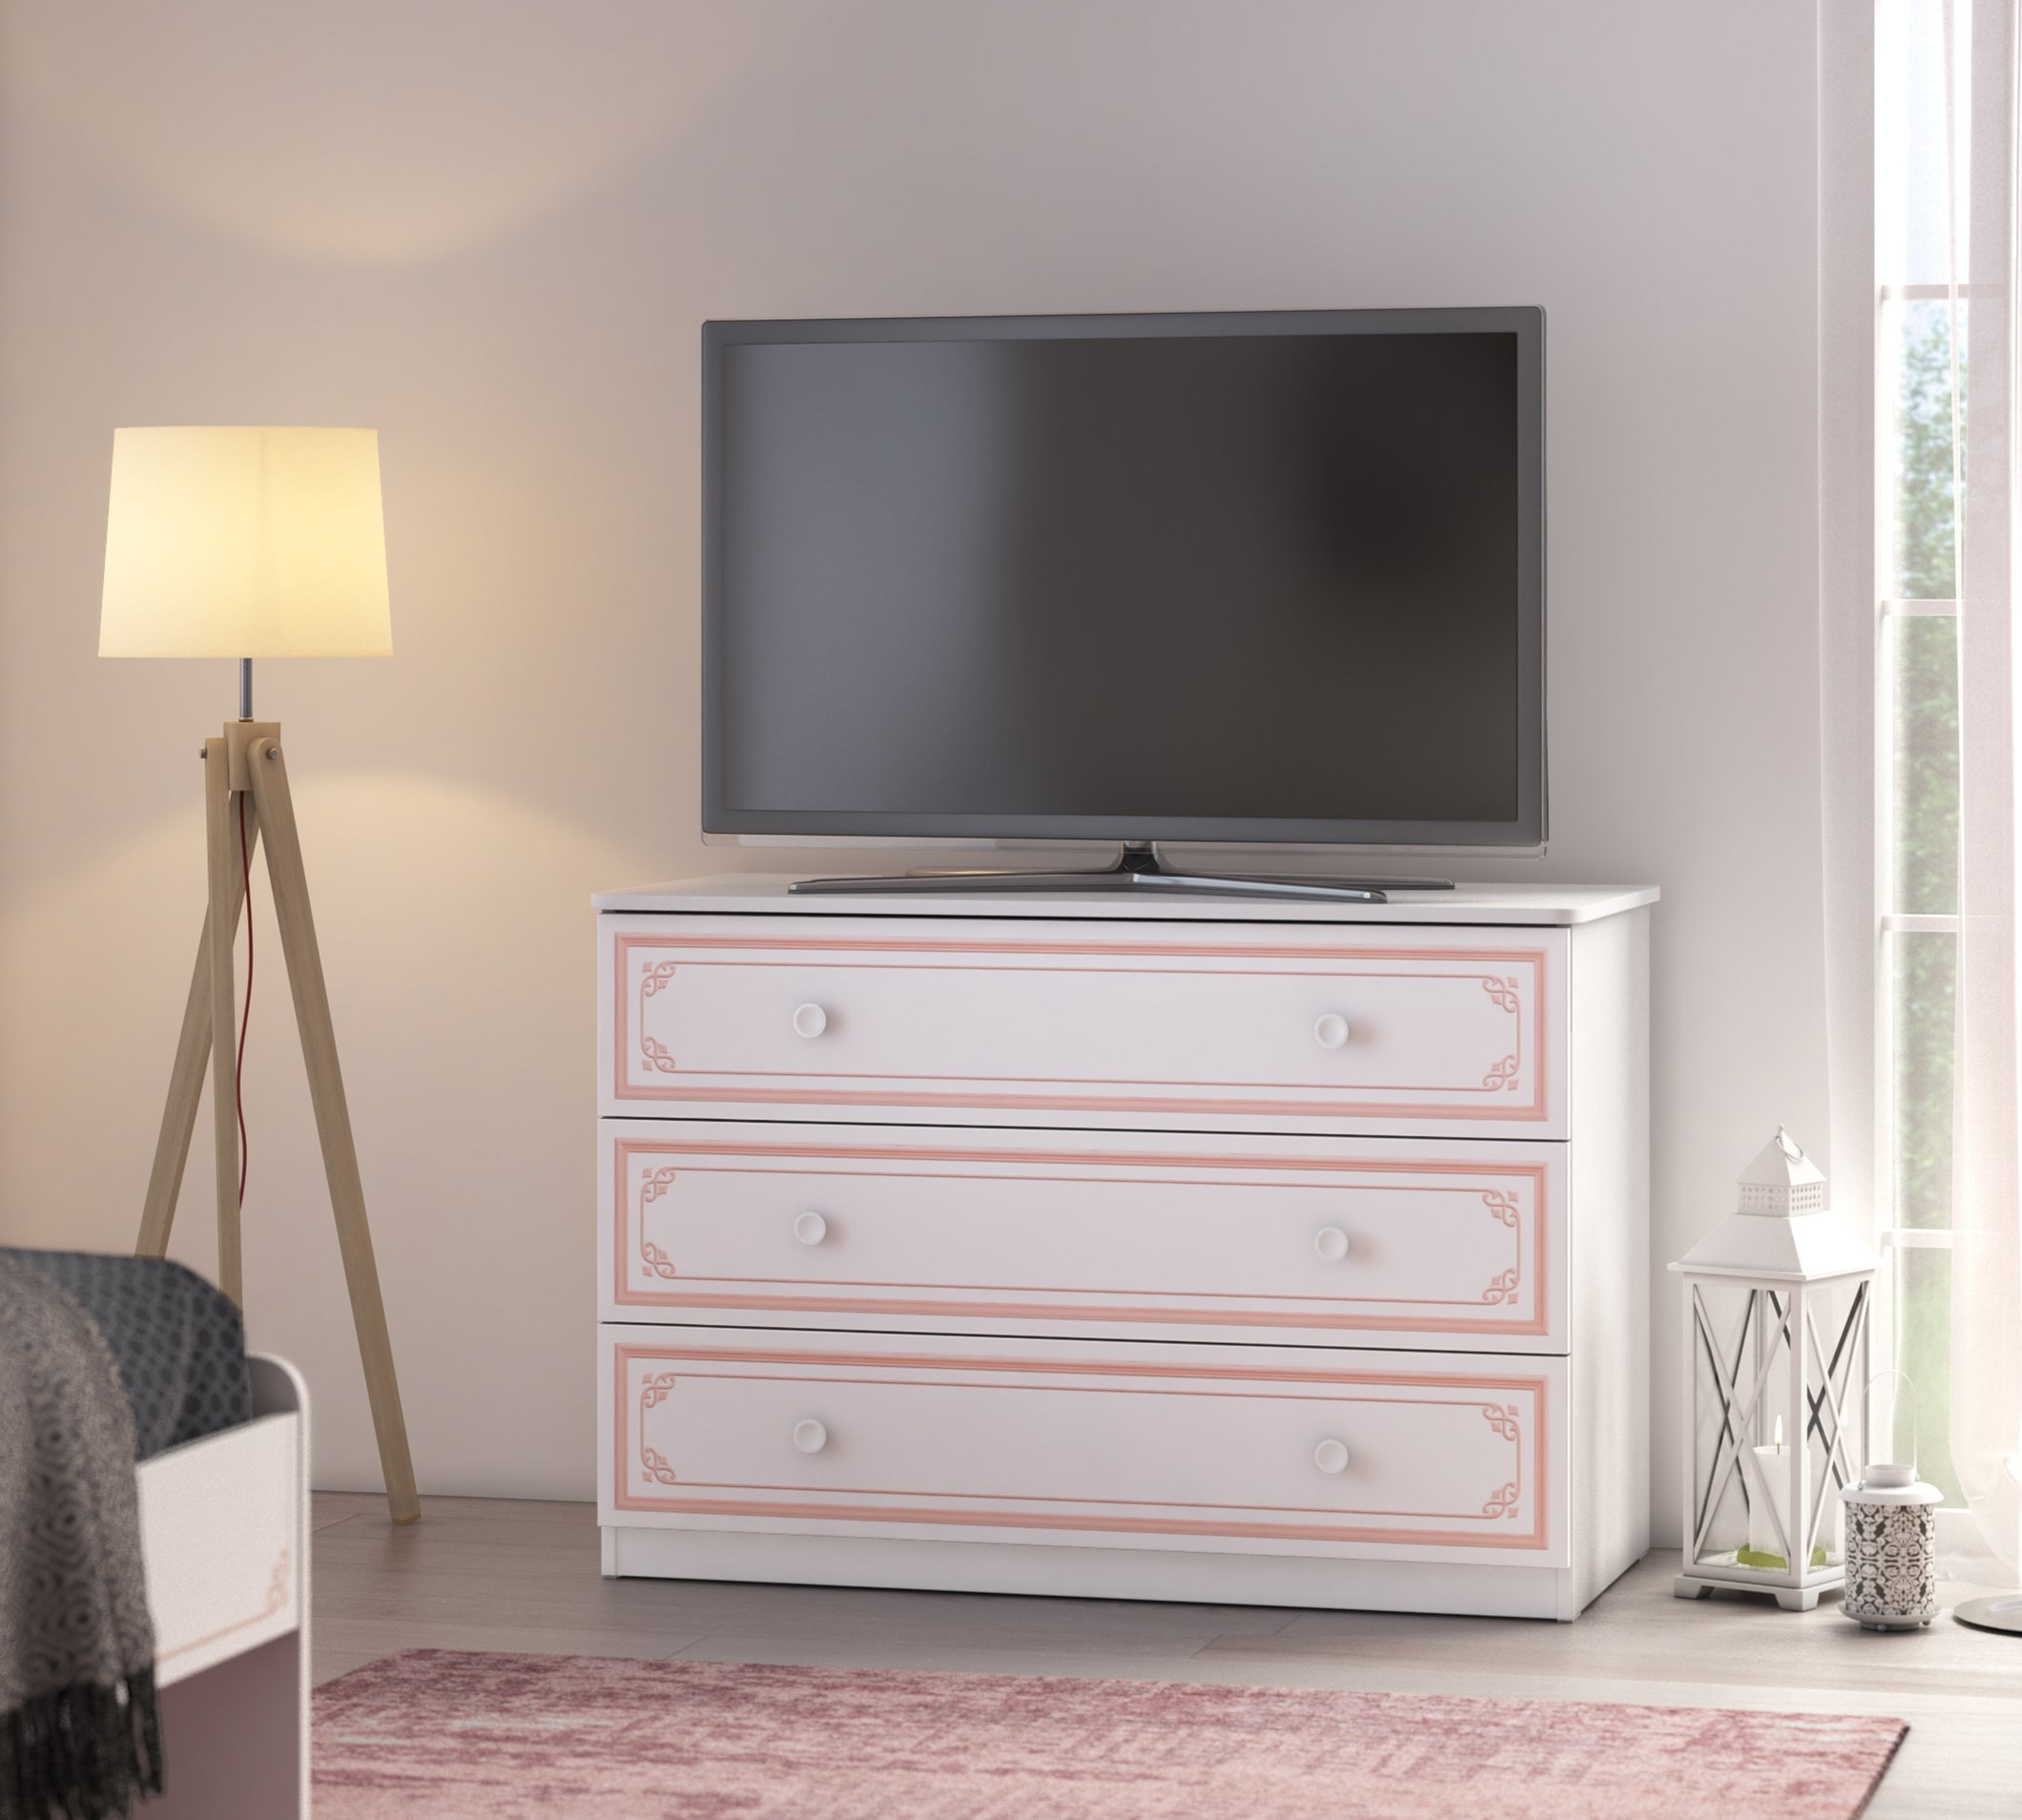 Comoda din pal cu 3 sertare, pentru tineret Selena Large Pink Alb / Roz, l107xA53xH75 cm imagine